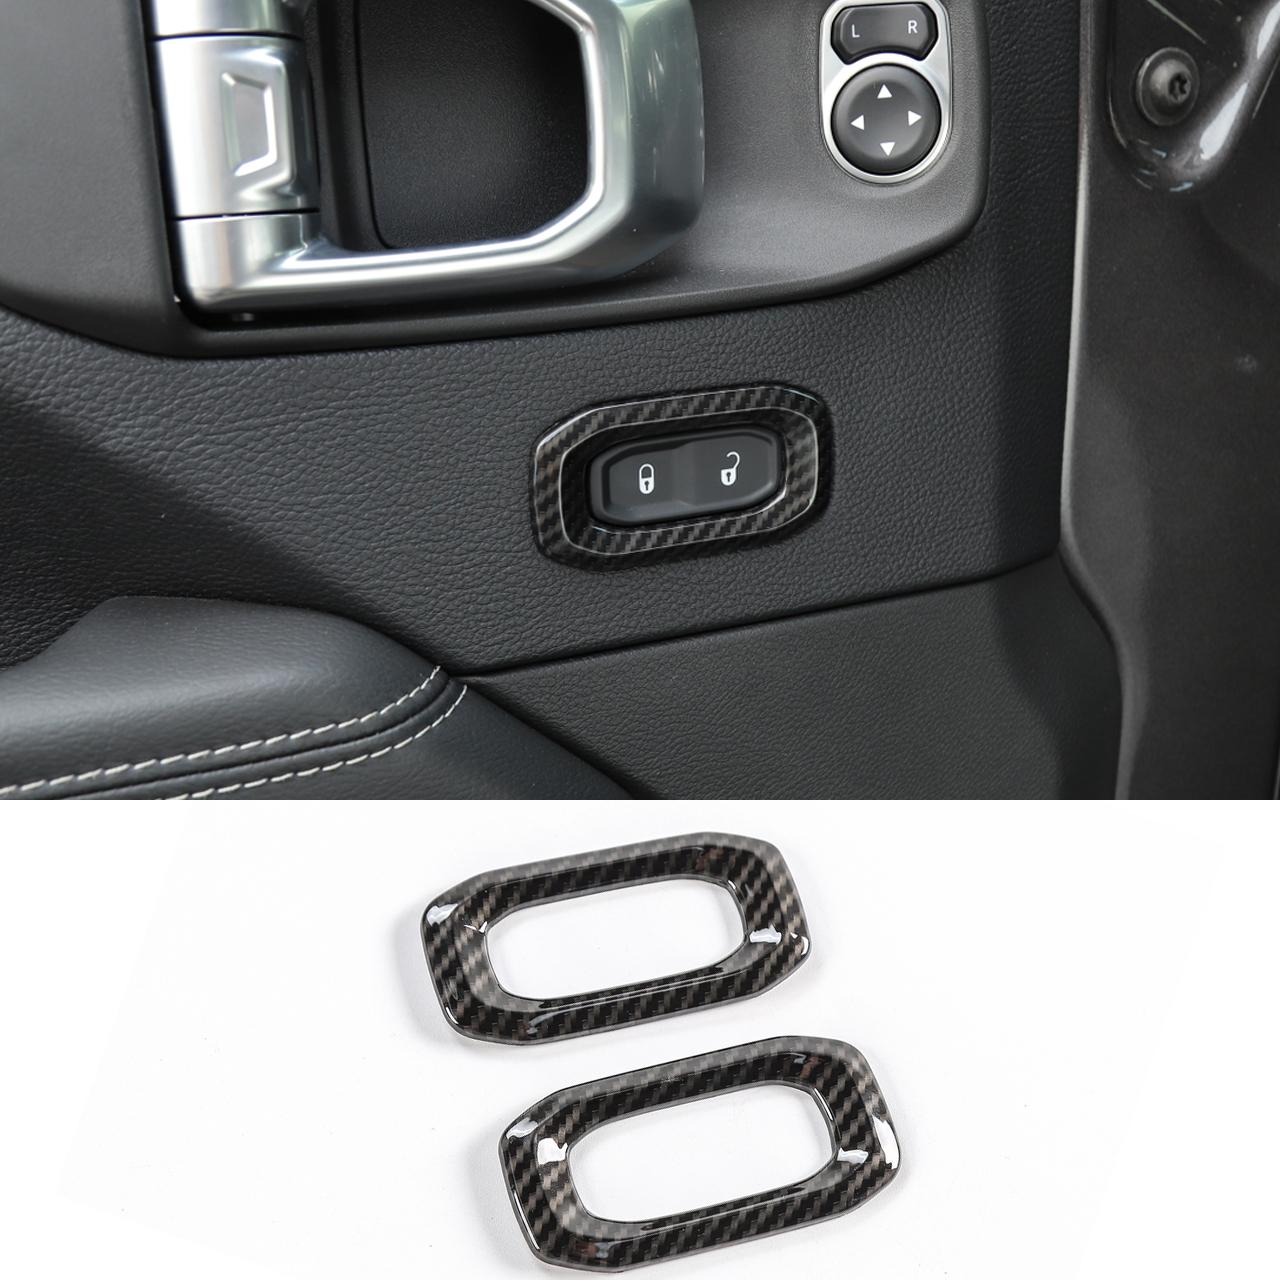 18-19 For Jeep Wrangler JL Carbon Fiber Accessories Car Door Handle Cover Trim